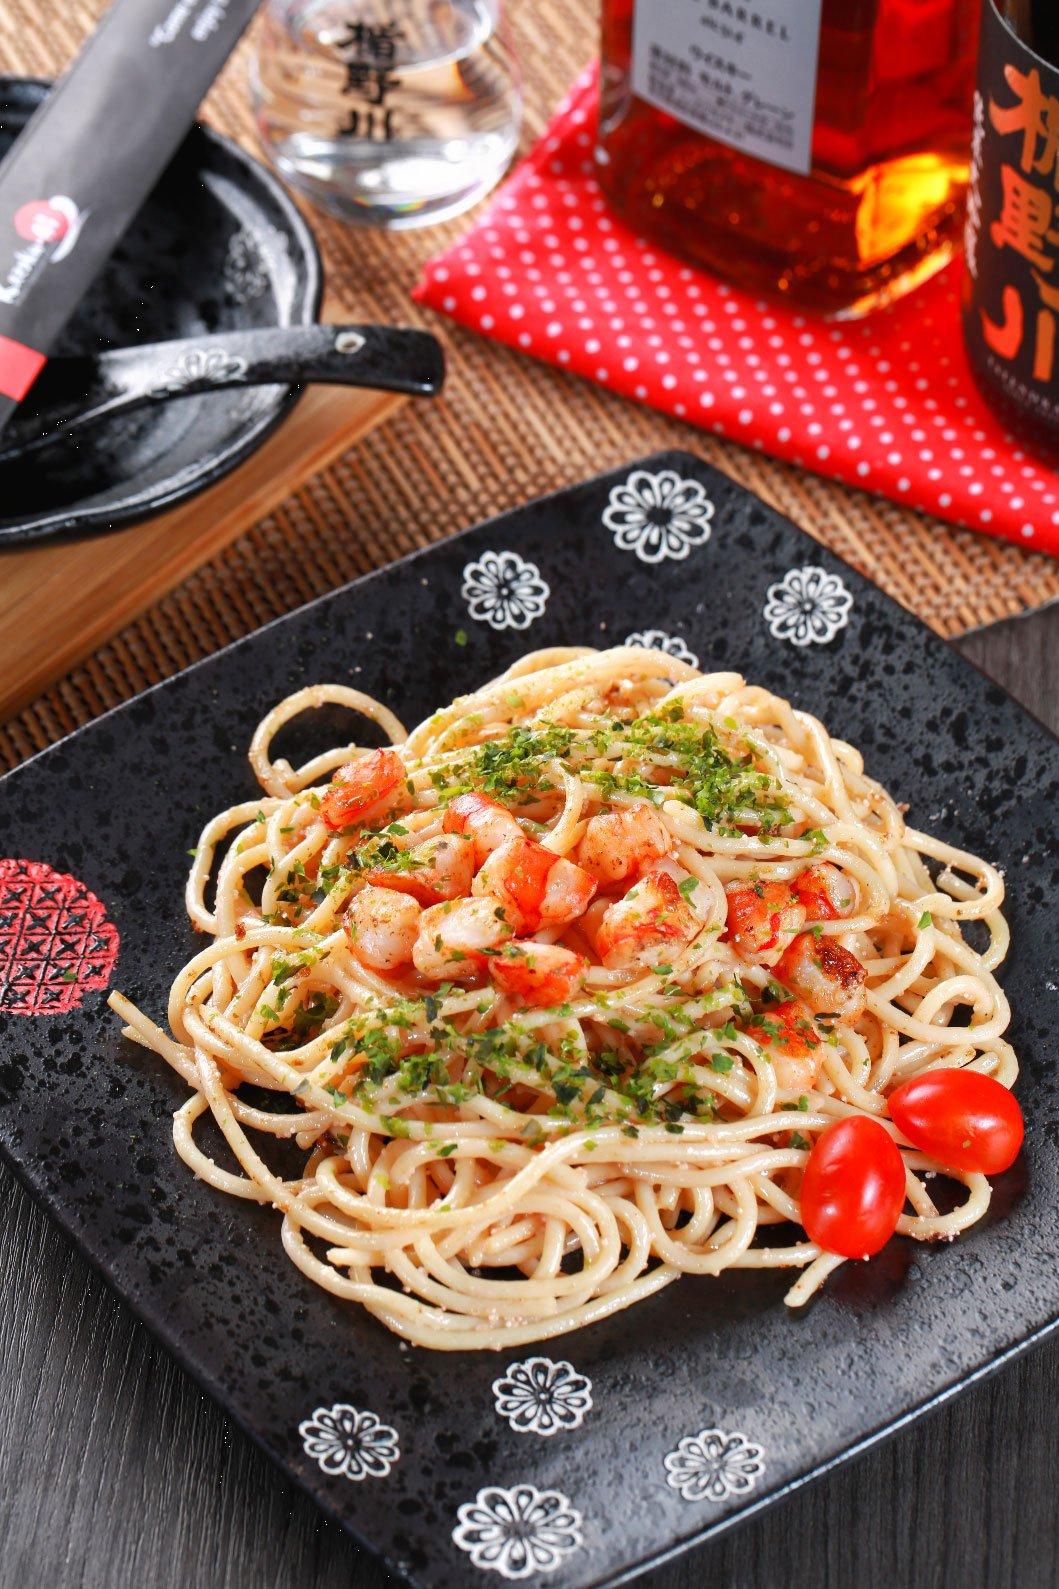 Taste Spaghetti Mentaiko best at japanese teppanyaki, malaysia